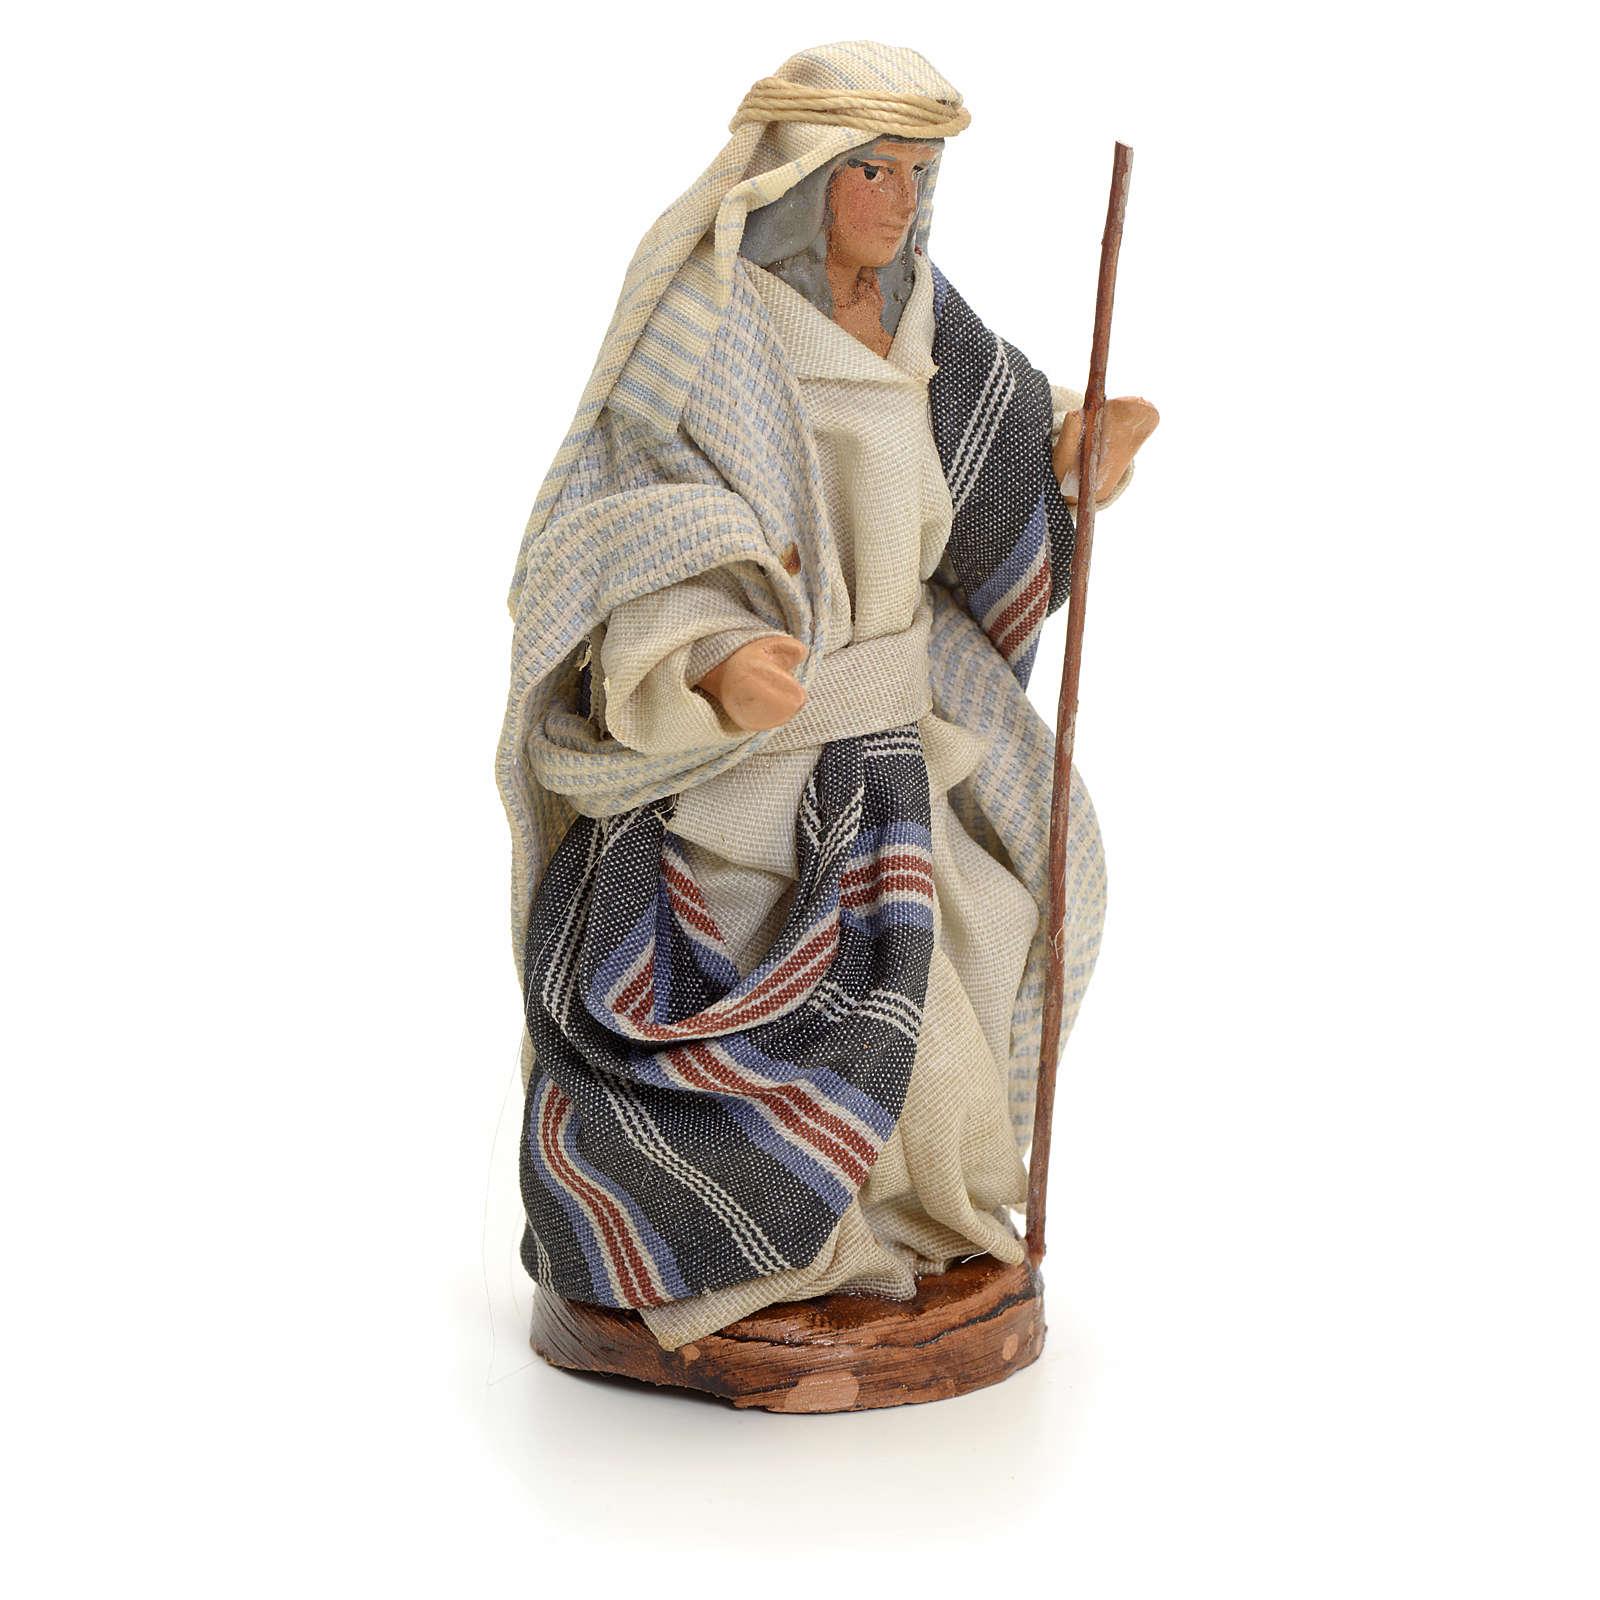 Neapolitan nativity figurine, Arabian man with stick, 8cm 4